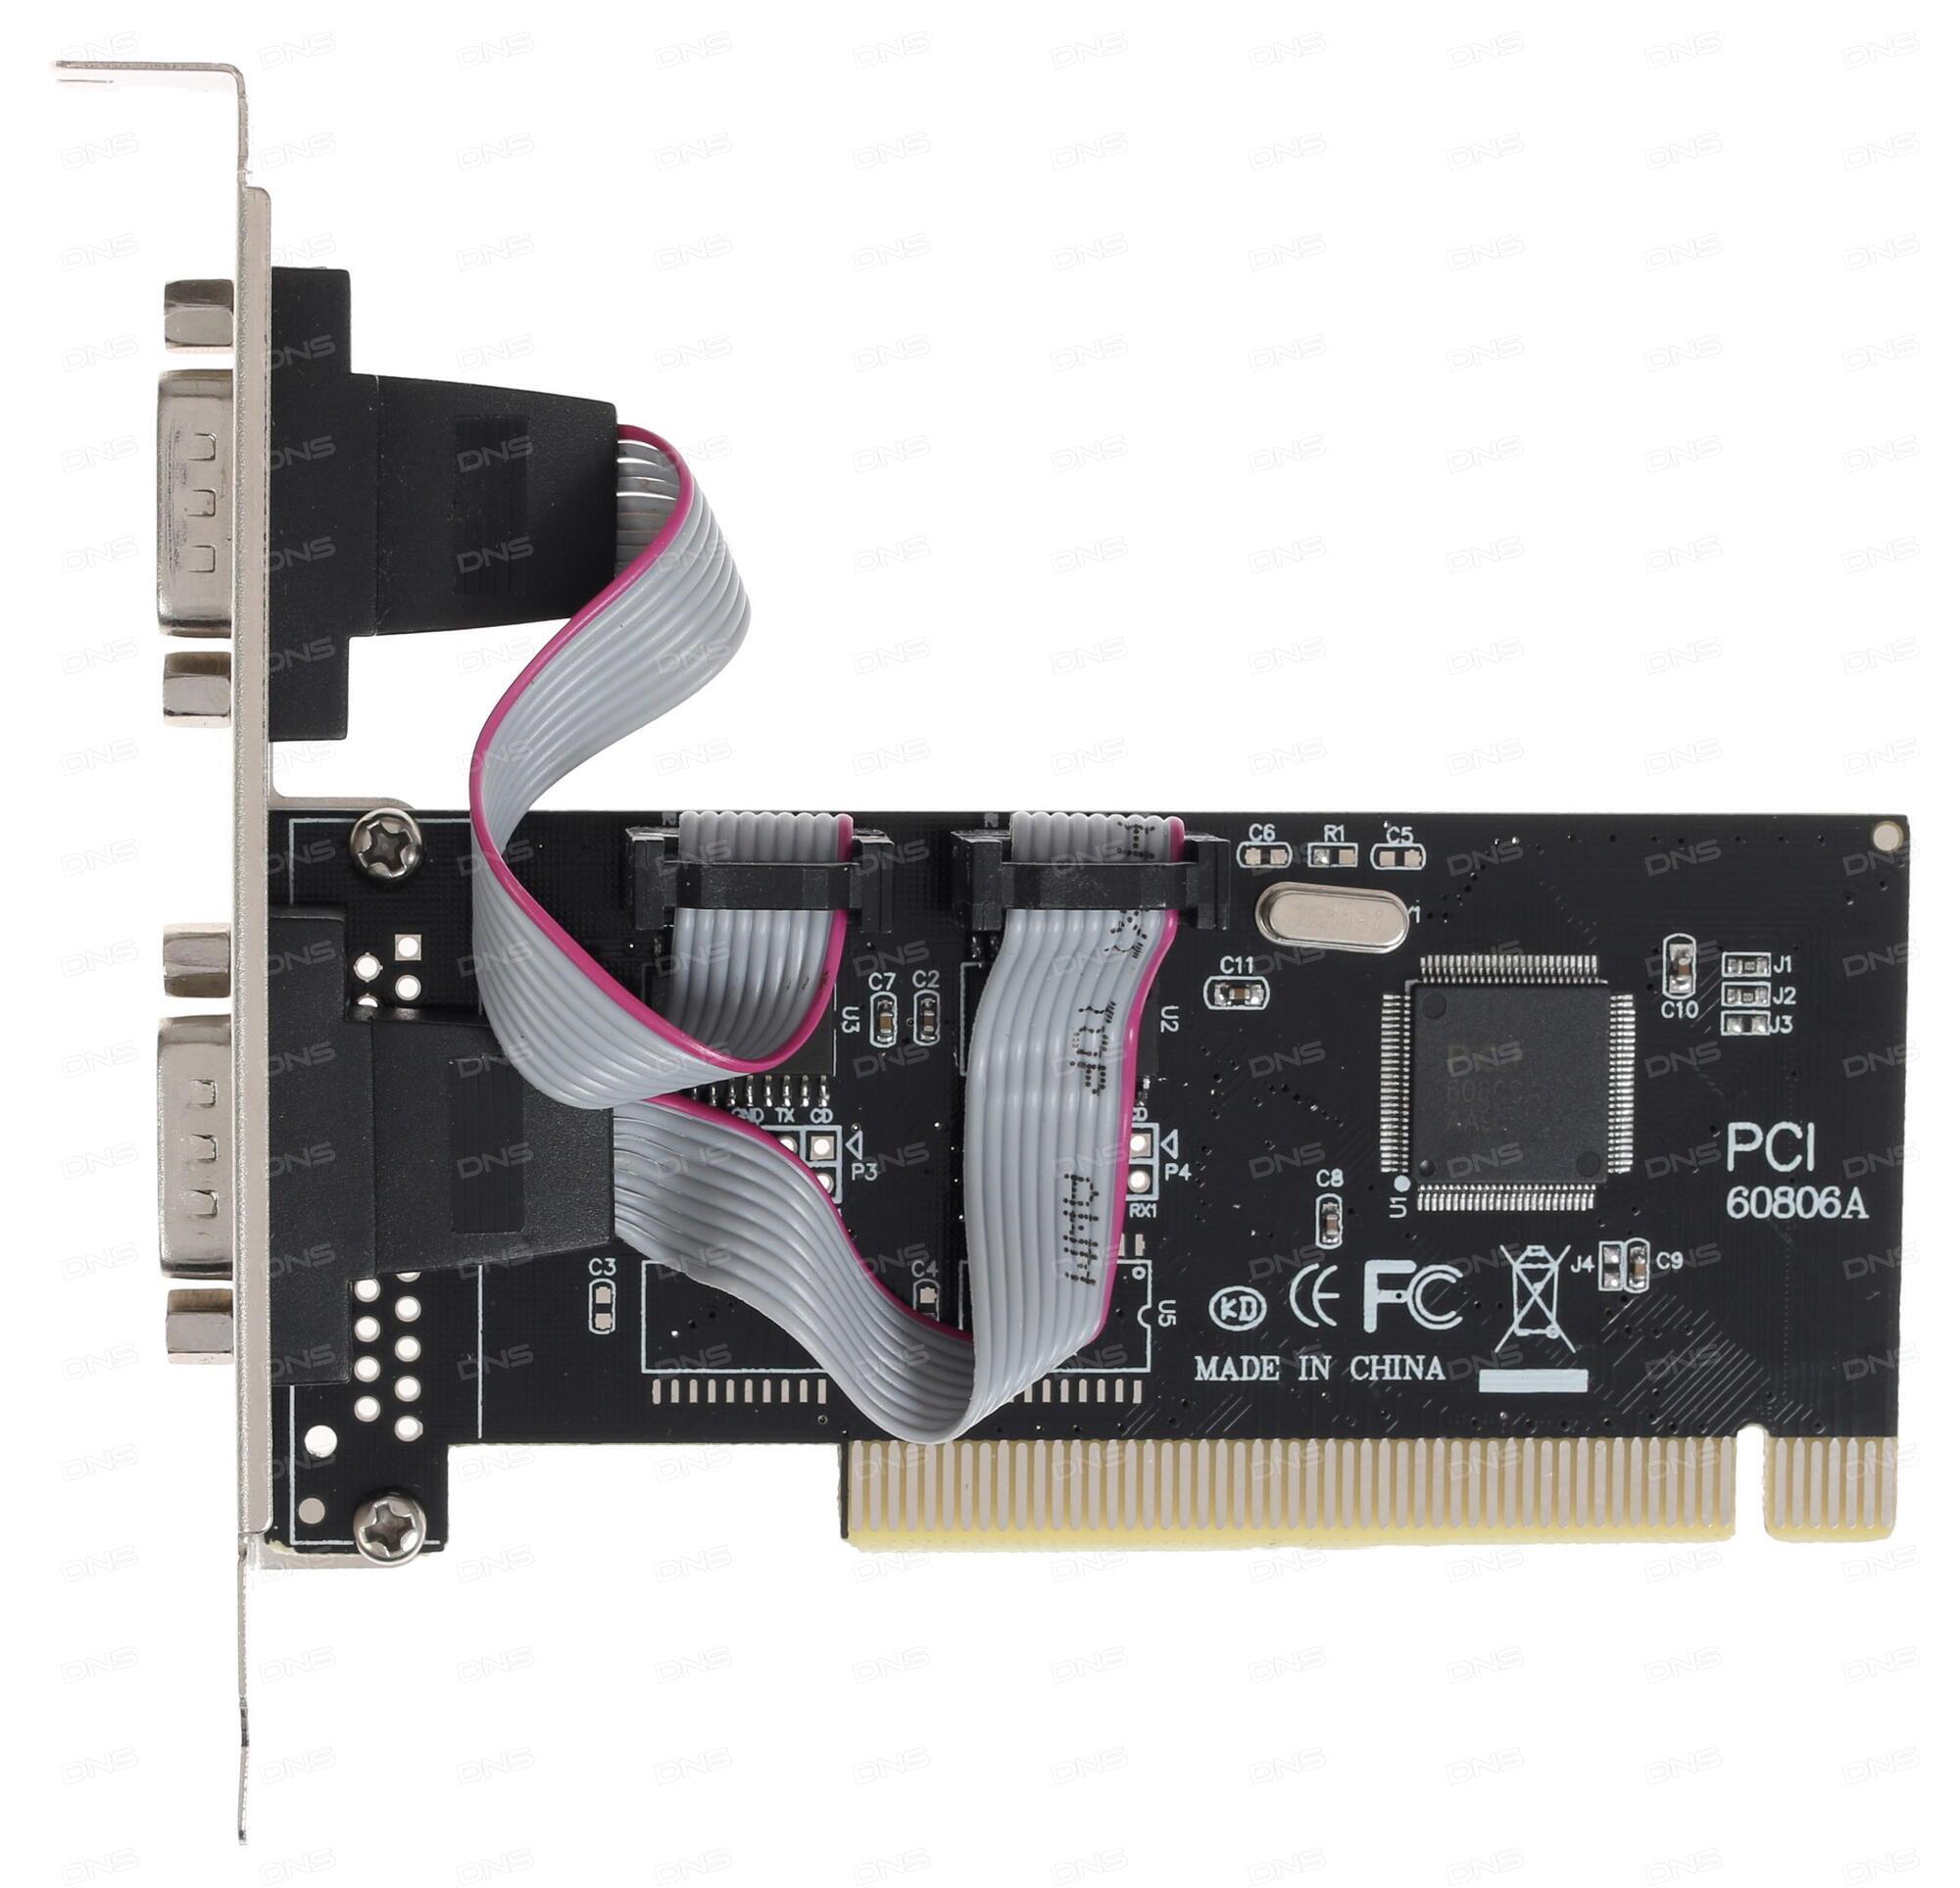 Контроллер PCI-E x1 to 1port SATA3 (6Gb/s) + 1 port mSATA  чип ASMedia ASM1061 PCIE020B Espada